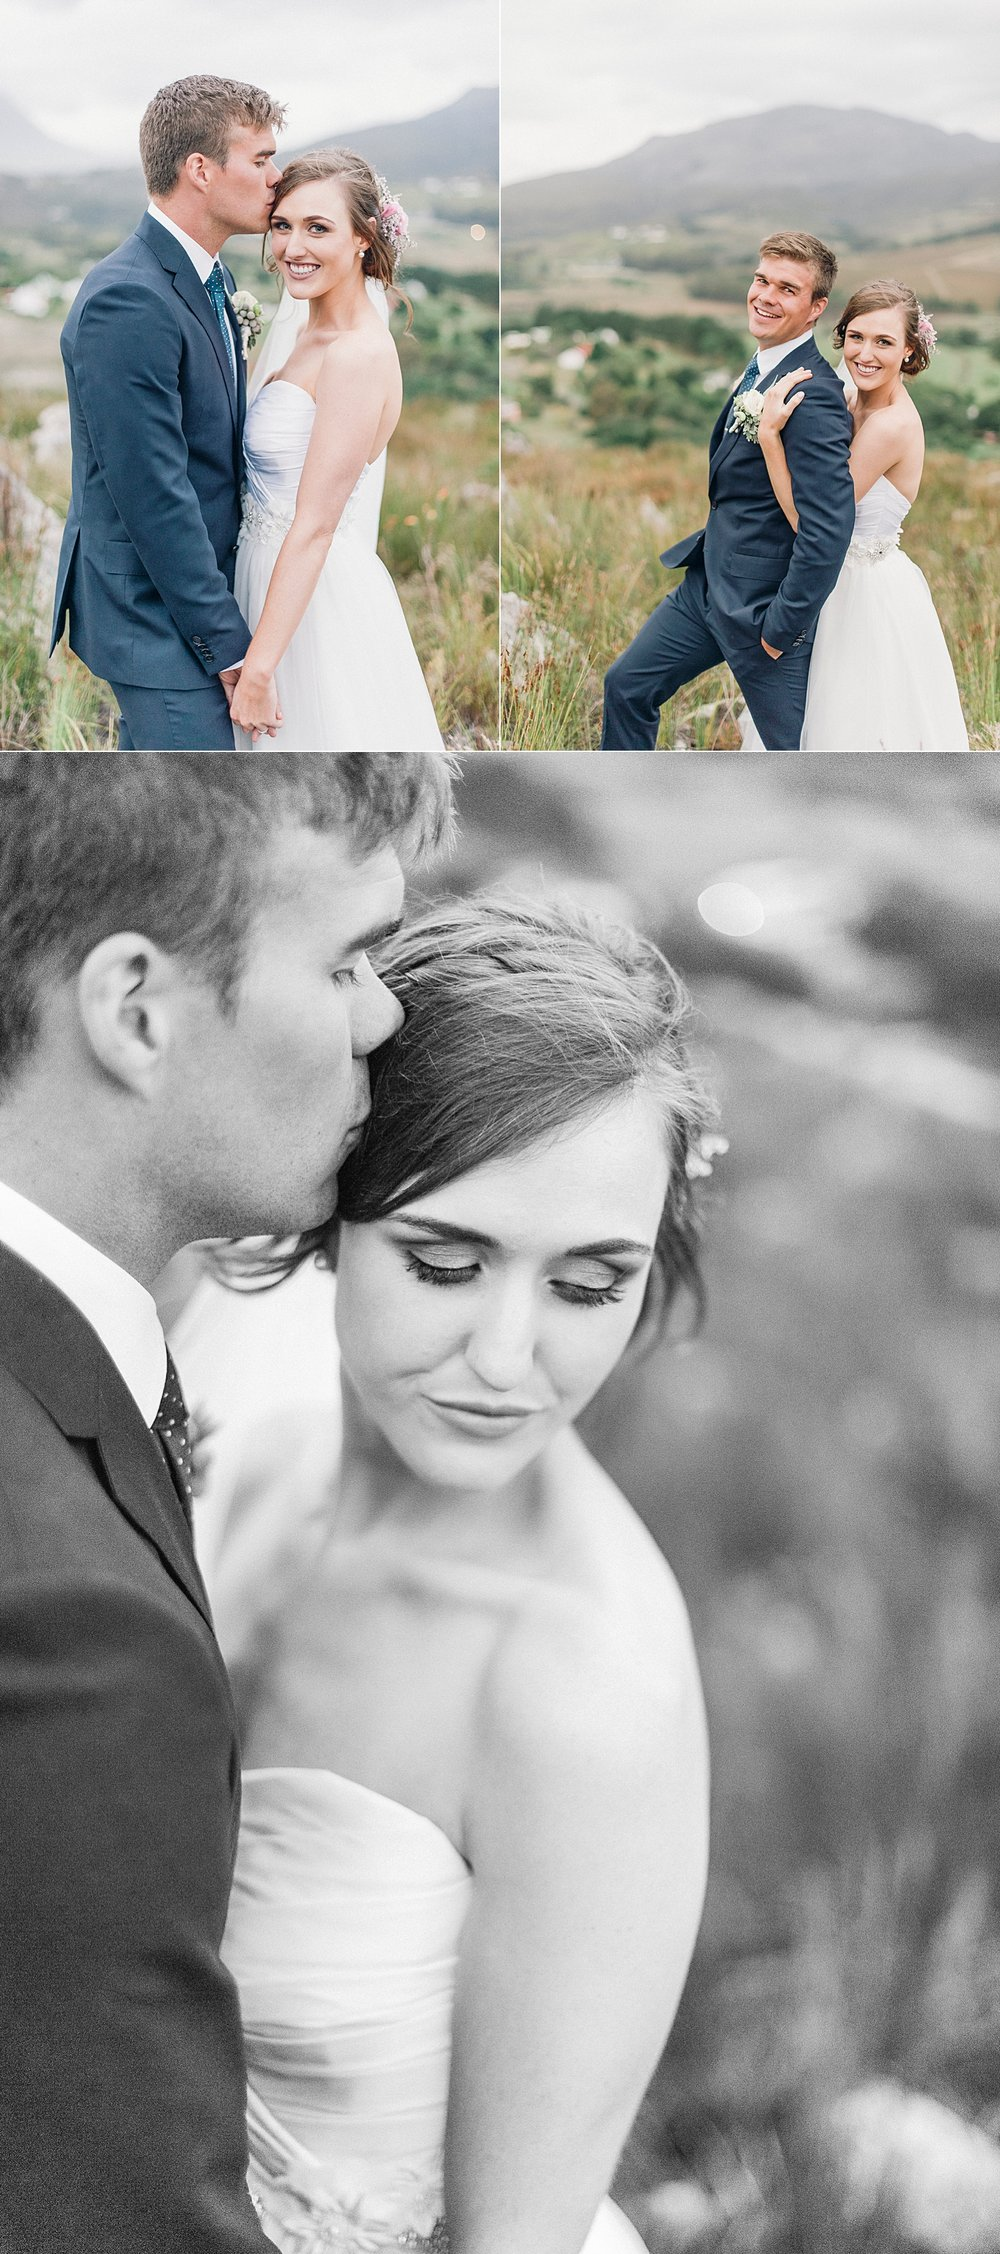 RyanParker_WeddingPhotographer_CapeTown_BonaDea_Hermanus_S&A_DSC_2025.jpg